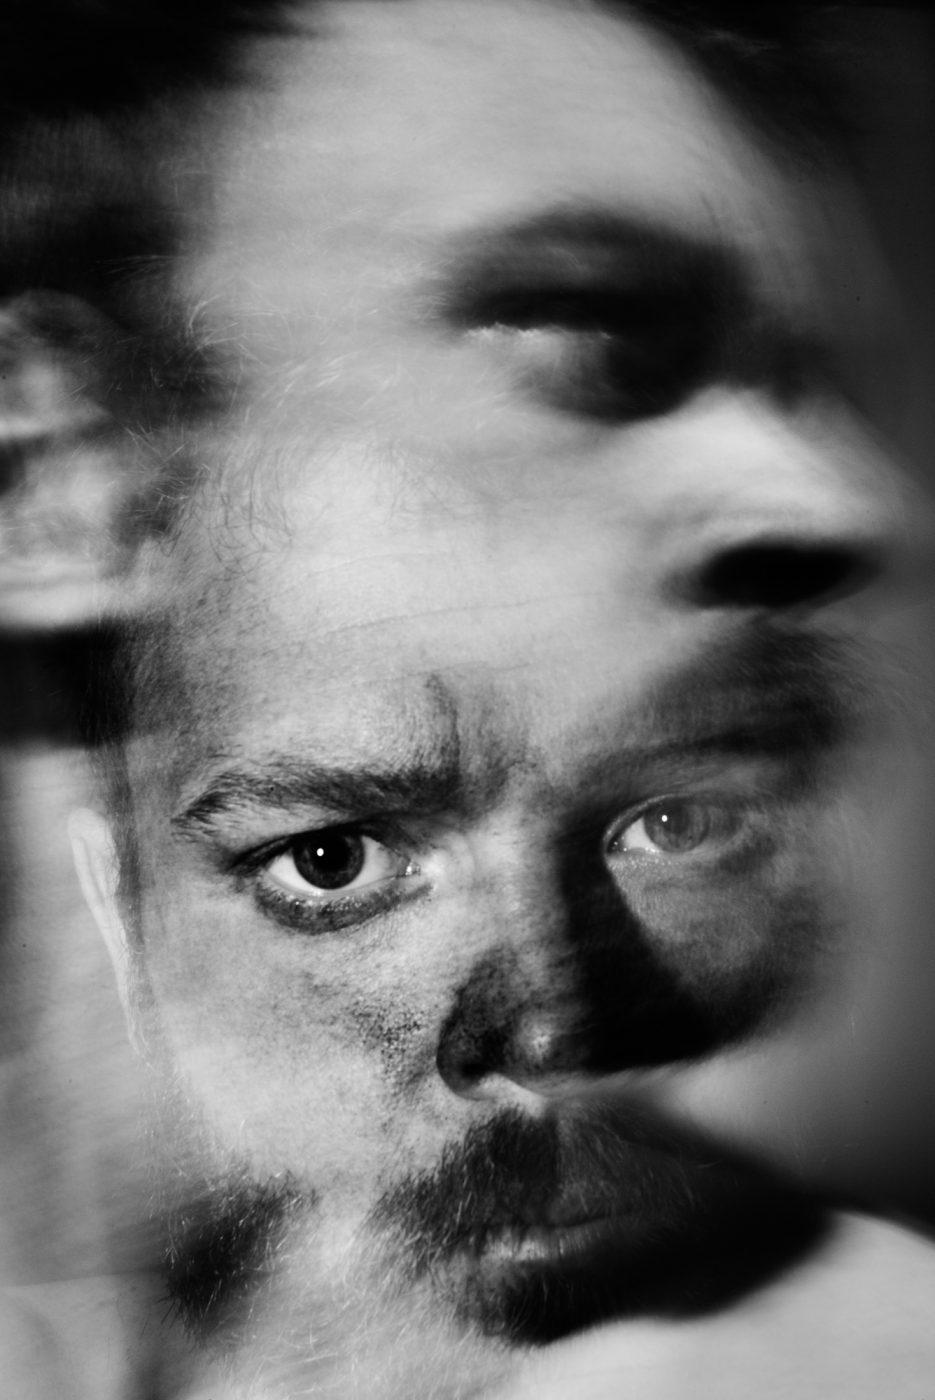 Photographer Bastien Deschamps